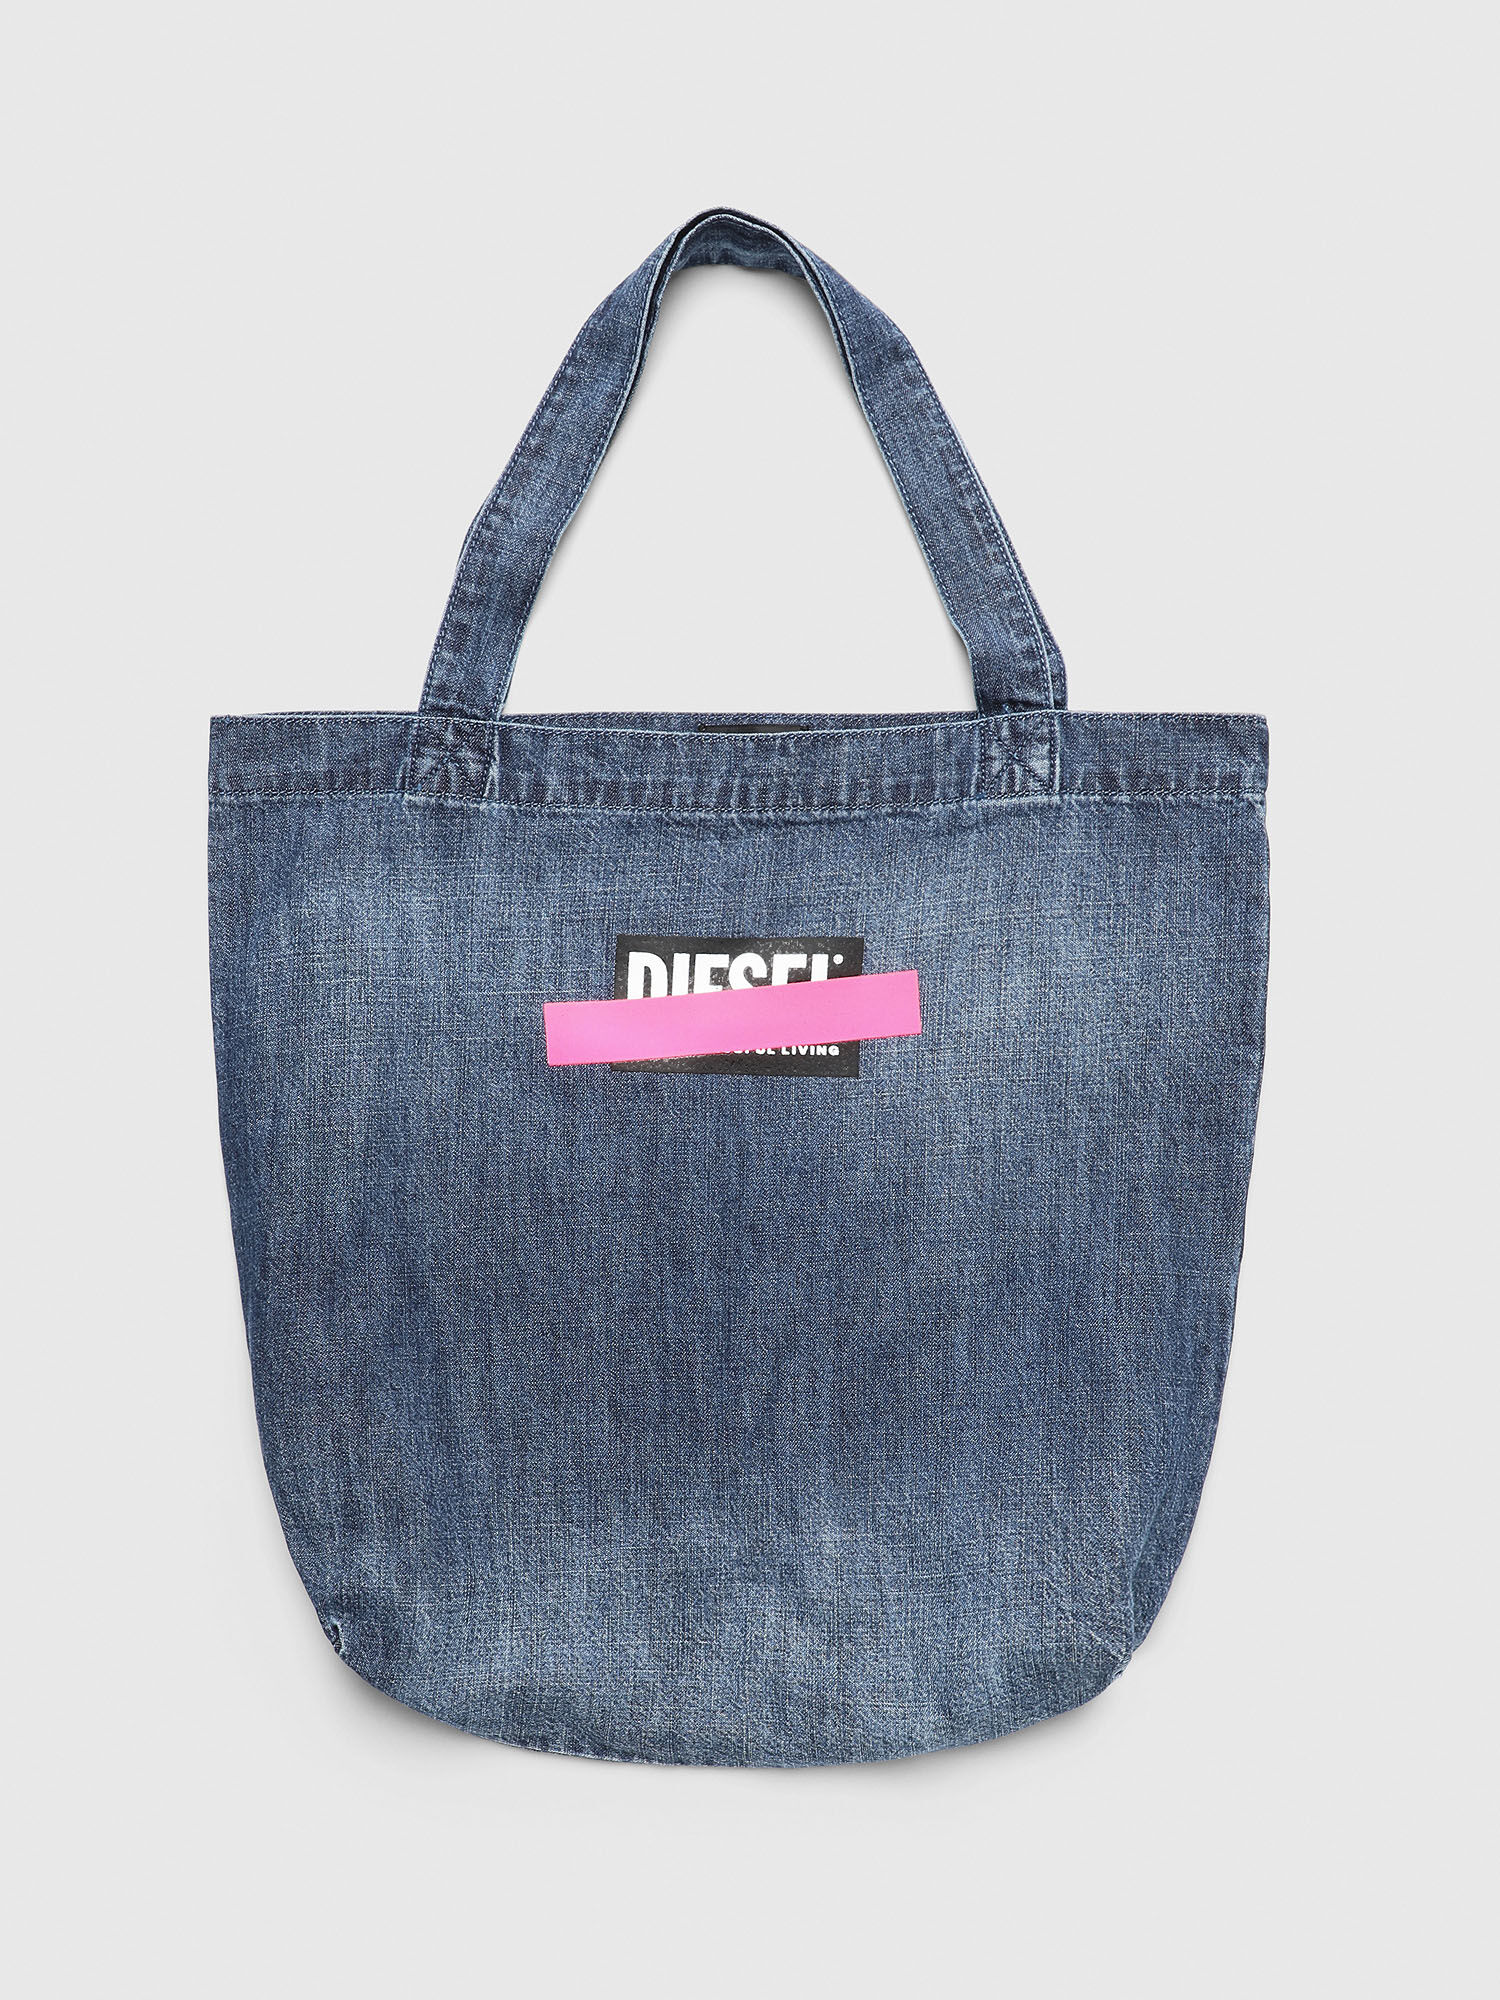 Neon Light Colorful Tote Bag Purse Handbag For Women Girls